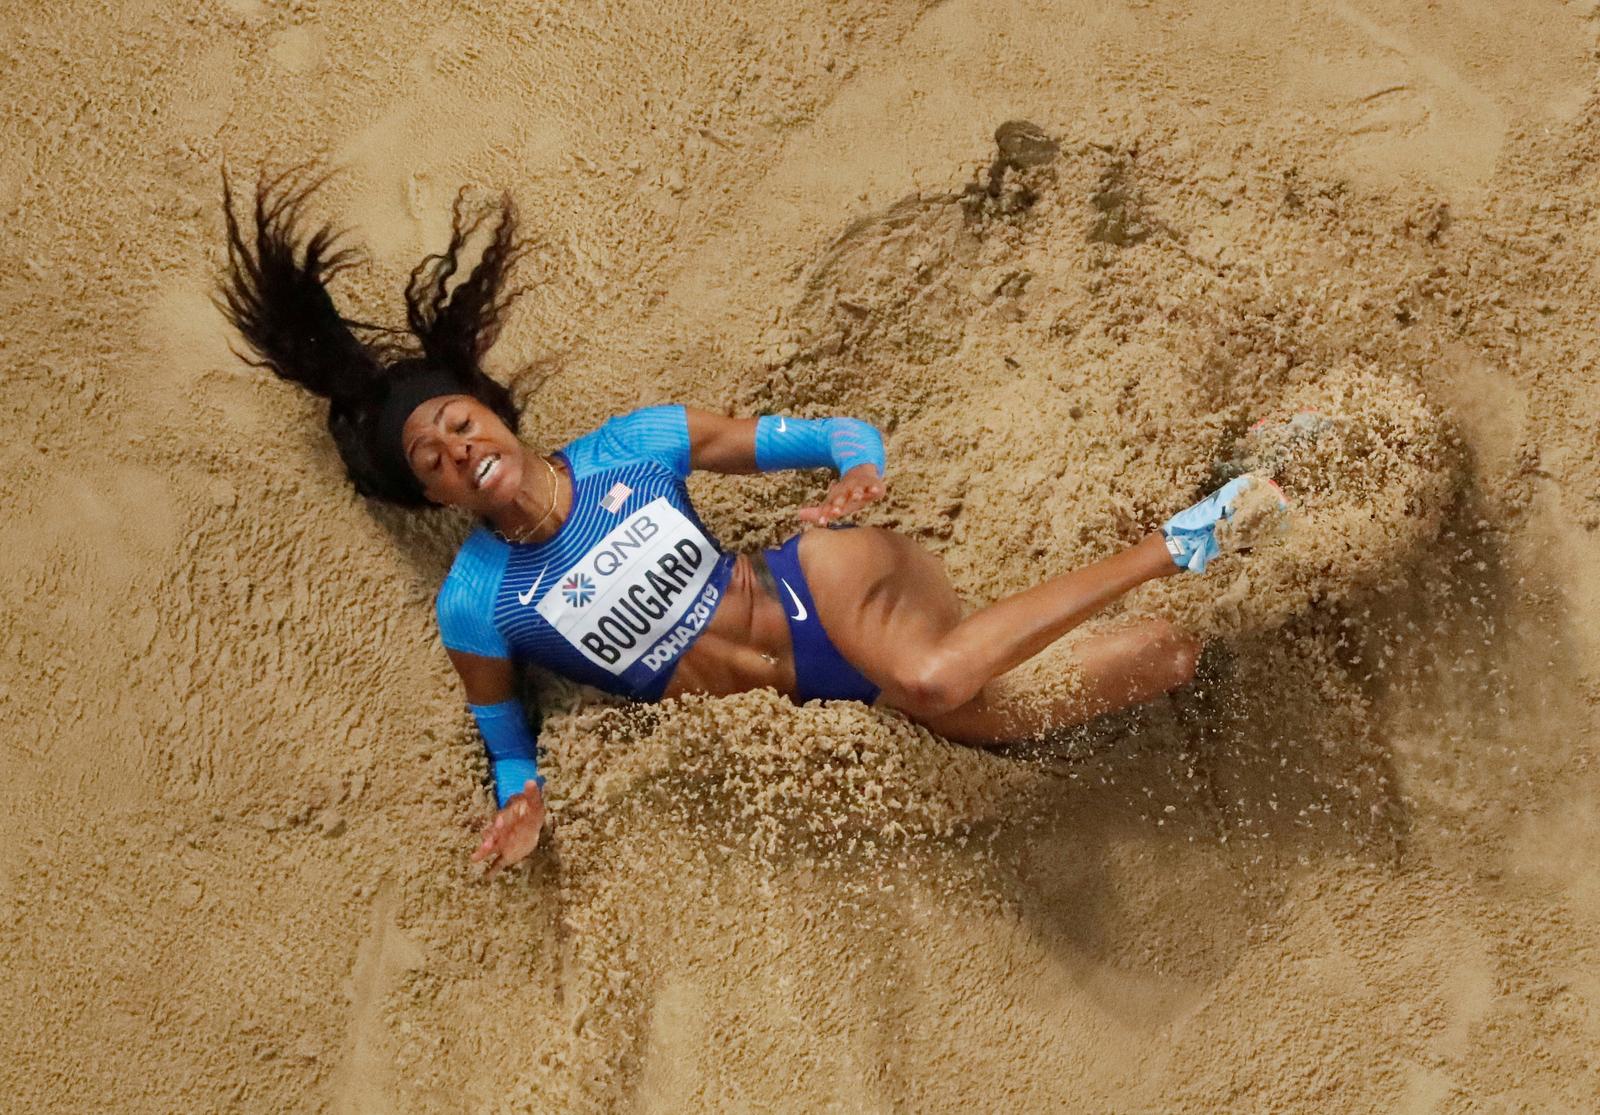 Athletics - World Athletics Championships - Doha 2019 - Women's Heptathlon Long Jump - Khalifa International Stadium, Doha, Qatar - October 3, 2019  Erica Bougard of the U.S. in action REUTERS